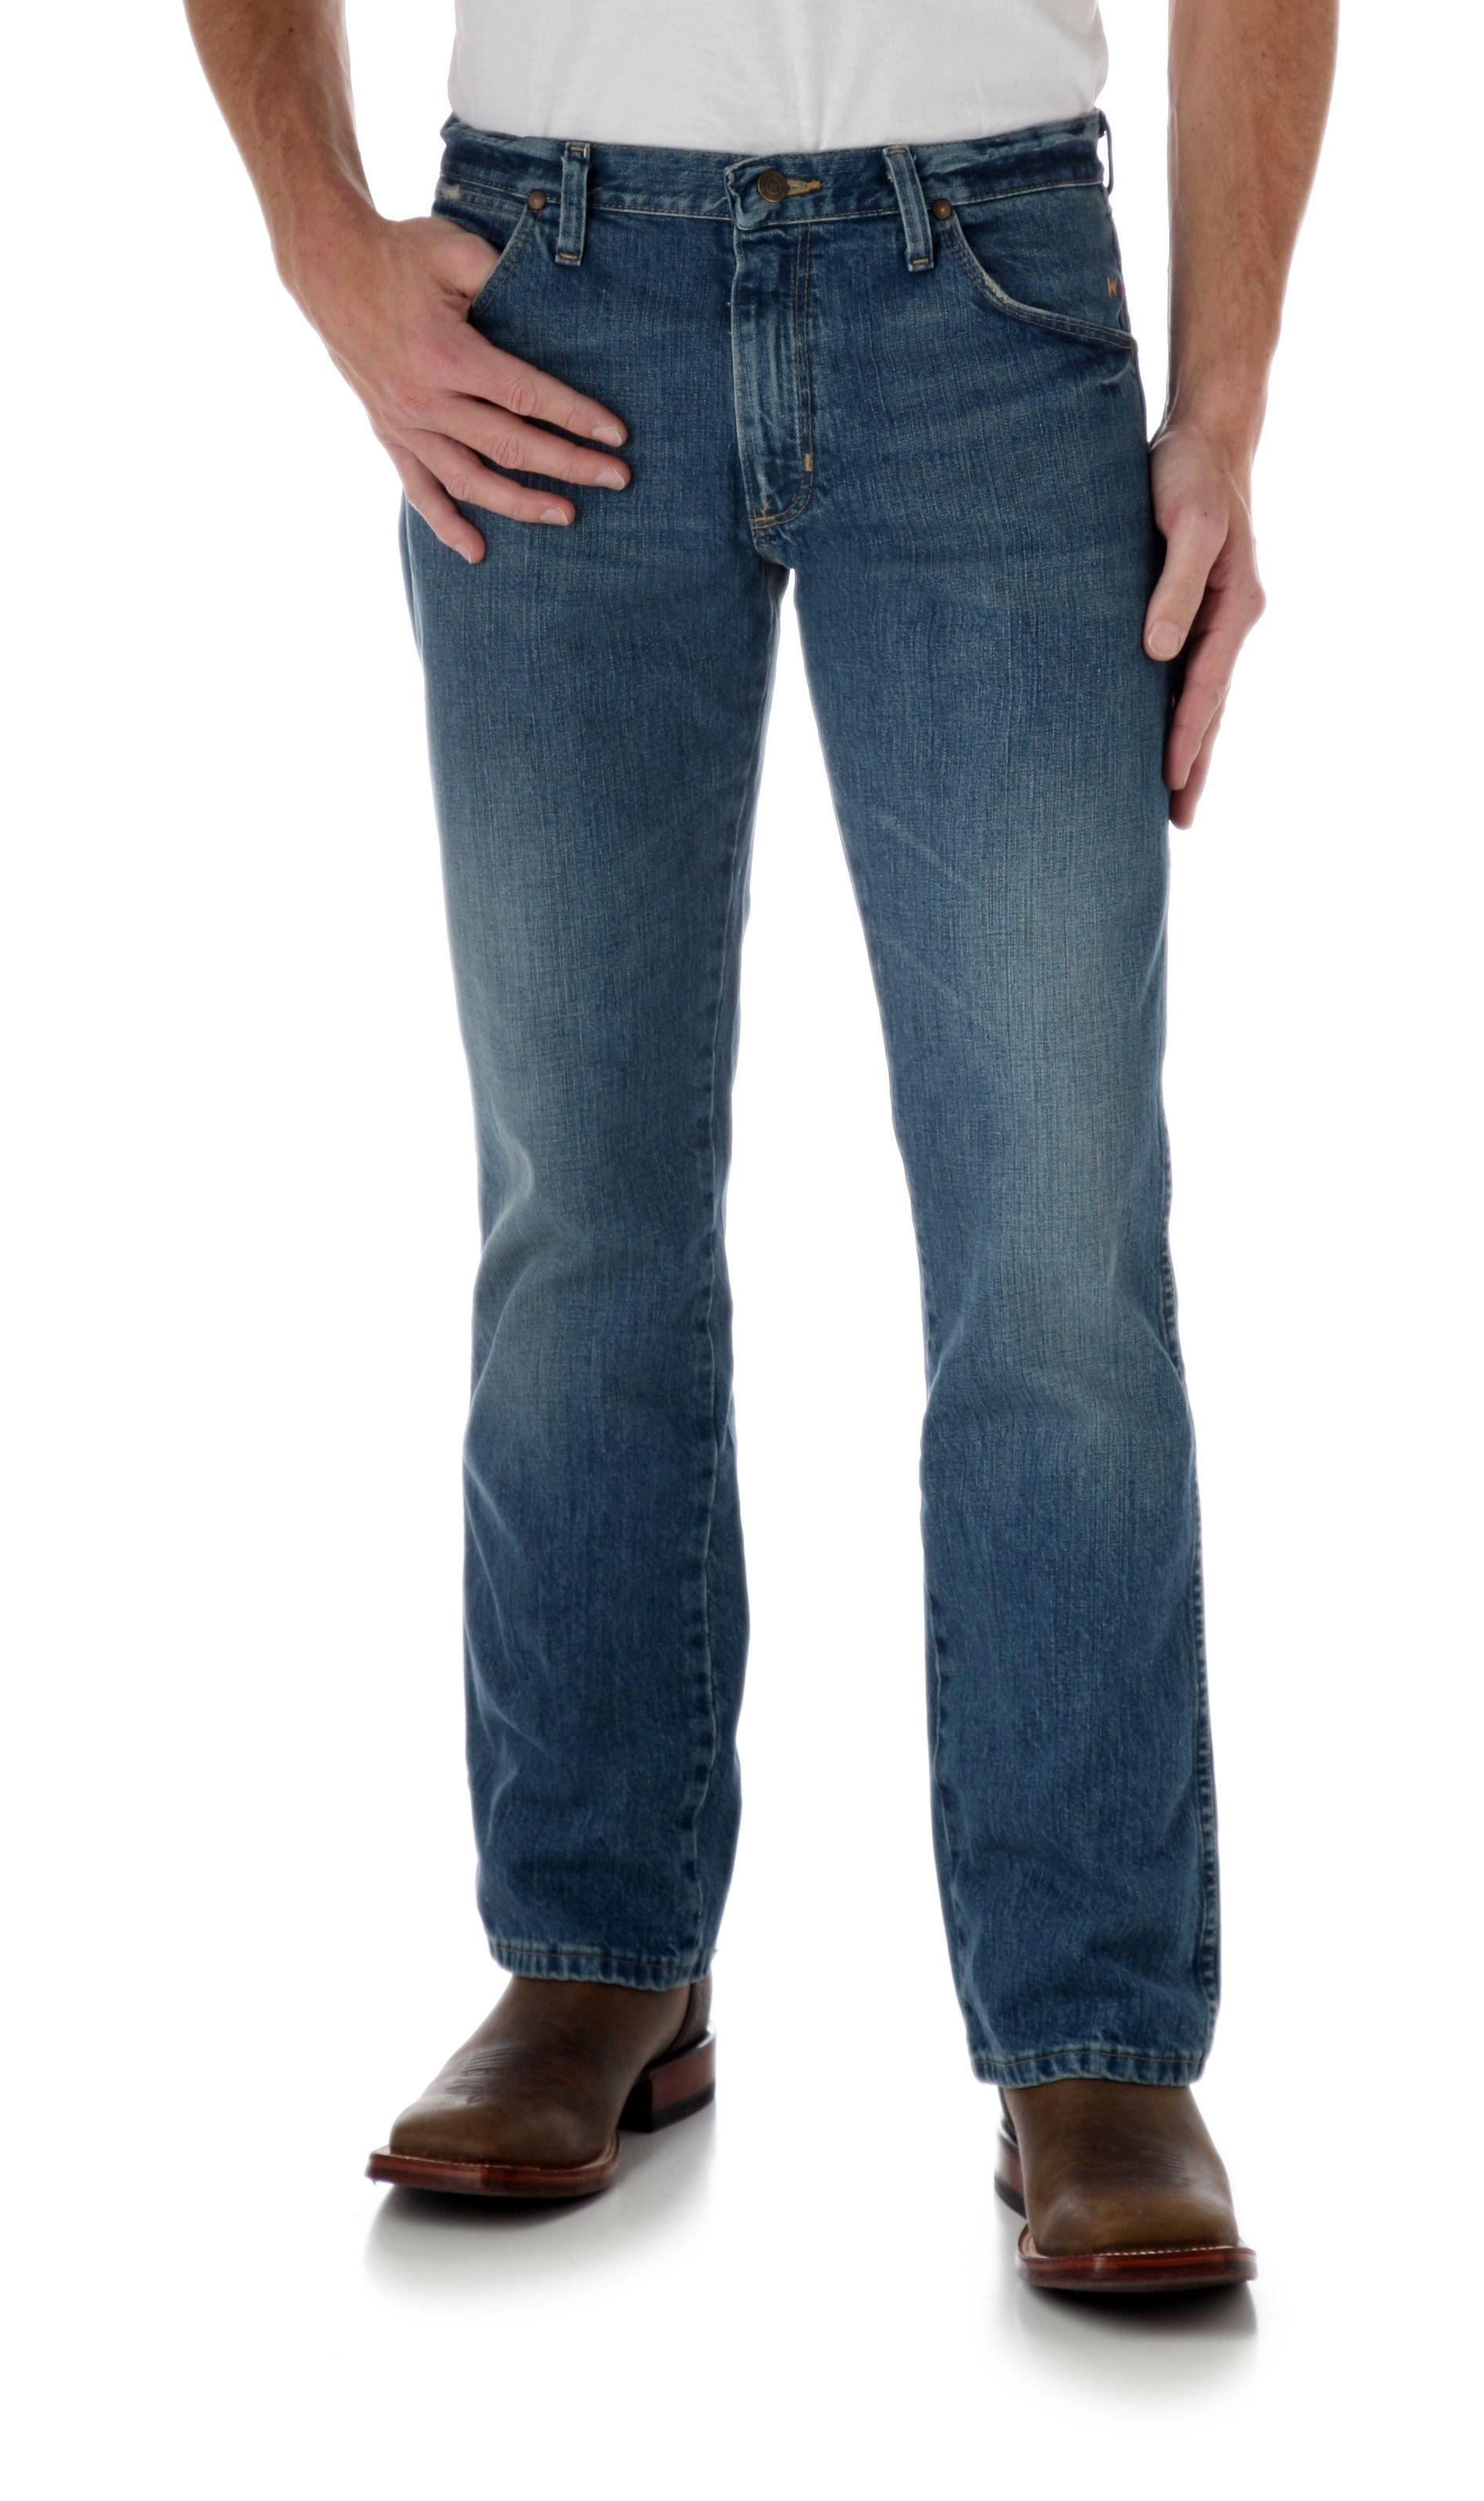 Wrangler Mens Premium Patch Yuma #77 Slim Fit Jeans (77MWZWO)